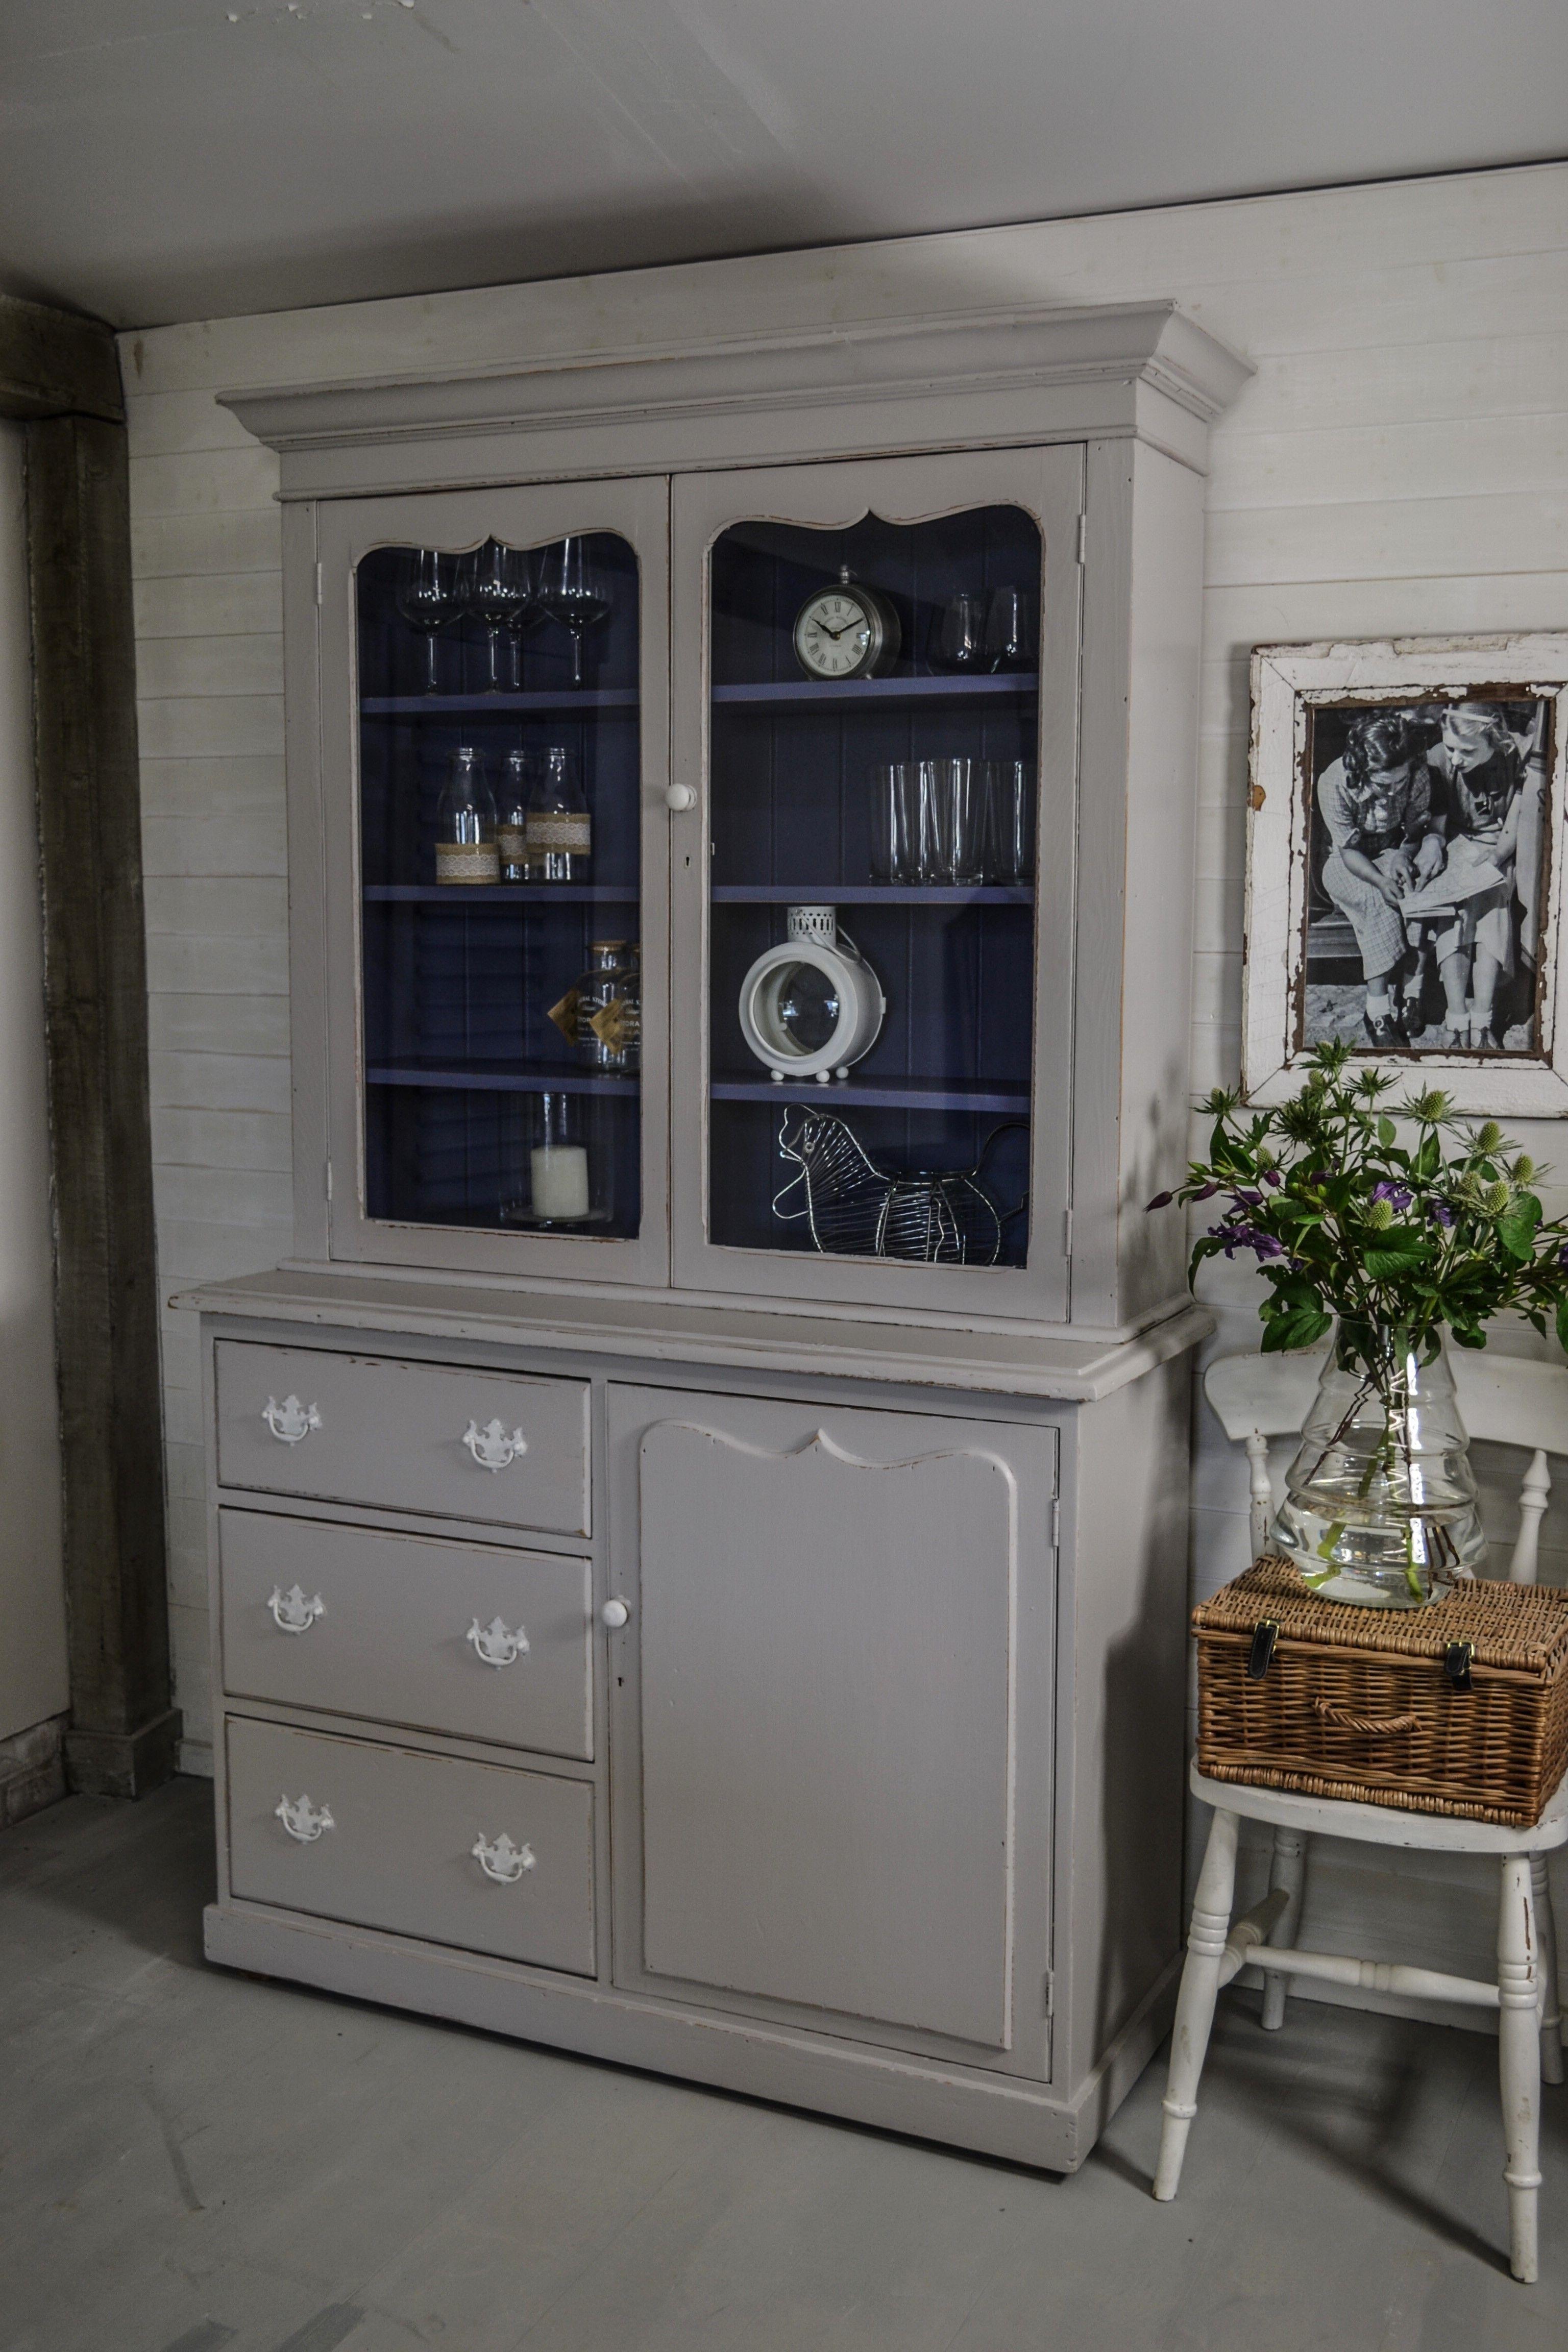 dresser antique buffet country small cupboard server kitchen sideboard oak listings base vinterior english furniture